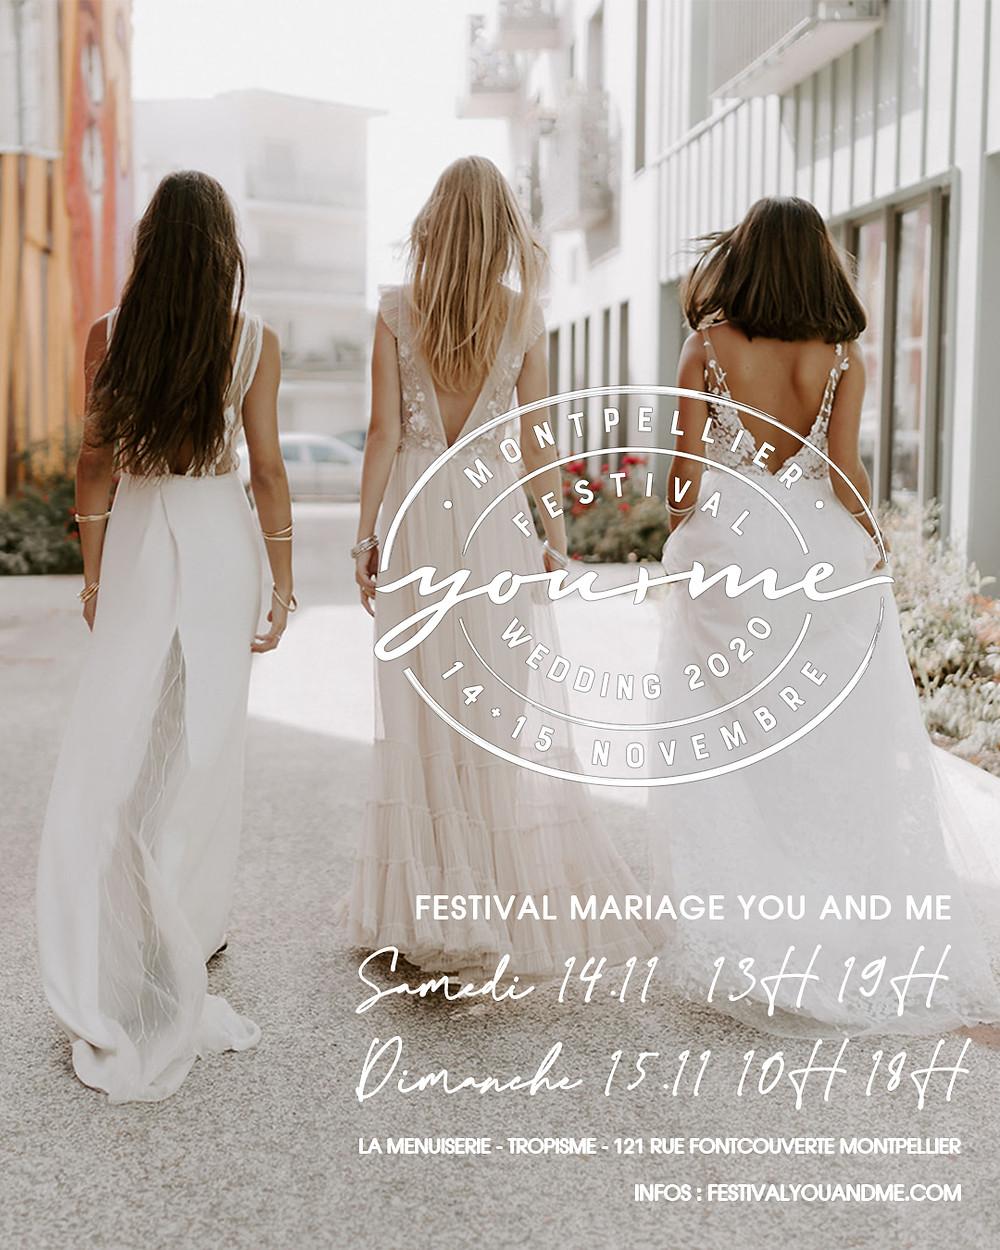 Festival mariage Montpellier 14+15 novembre 2020